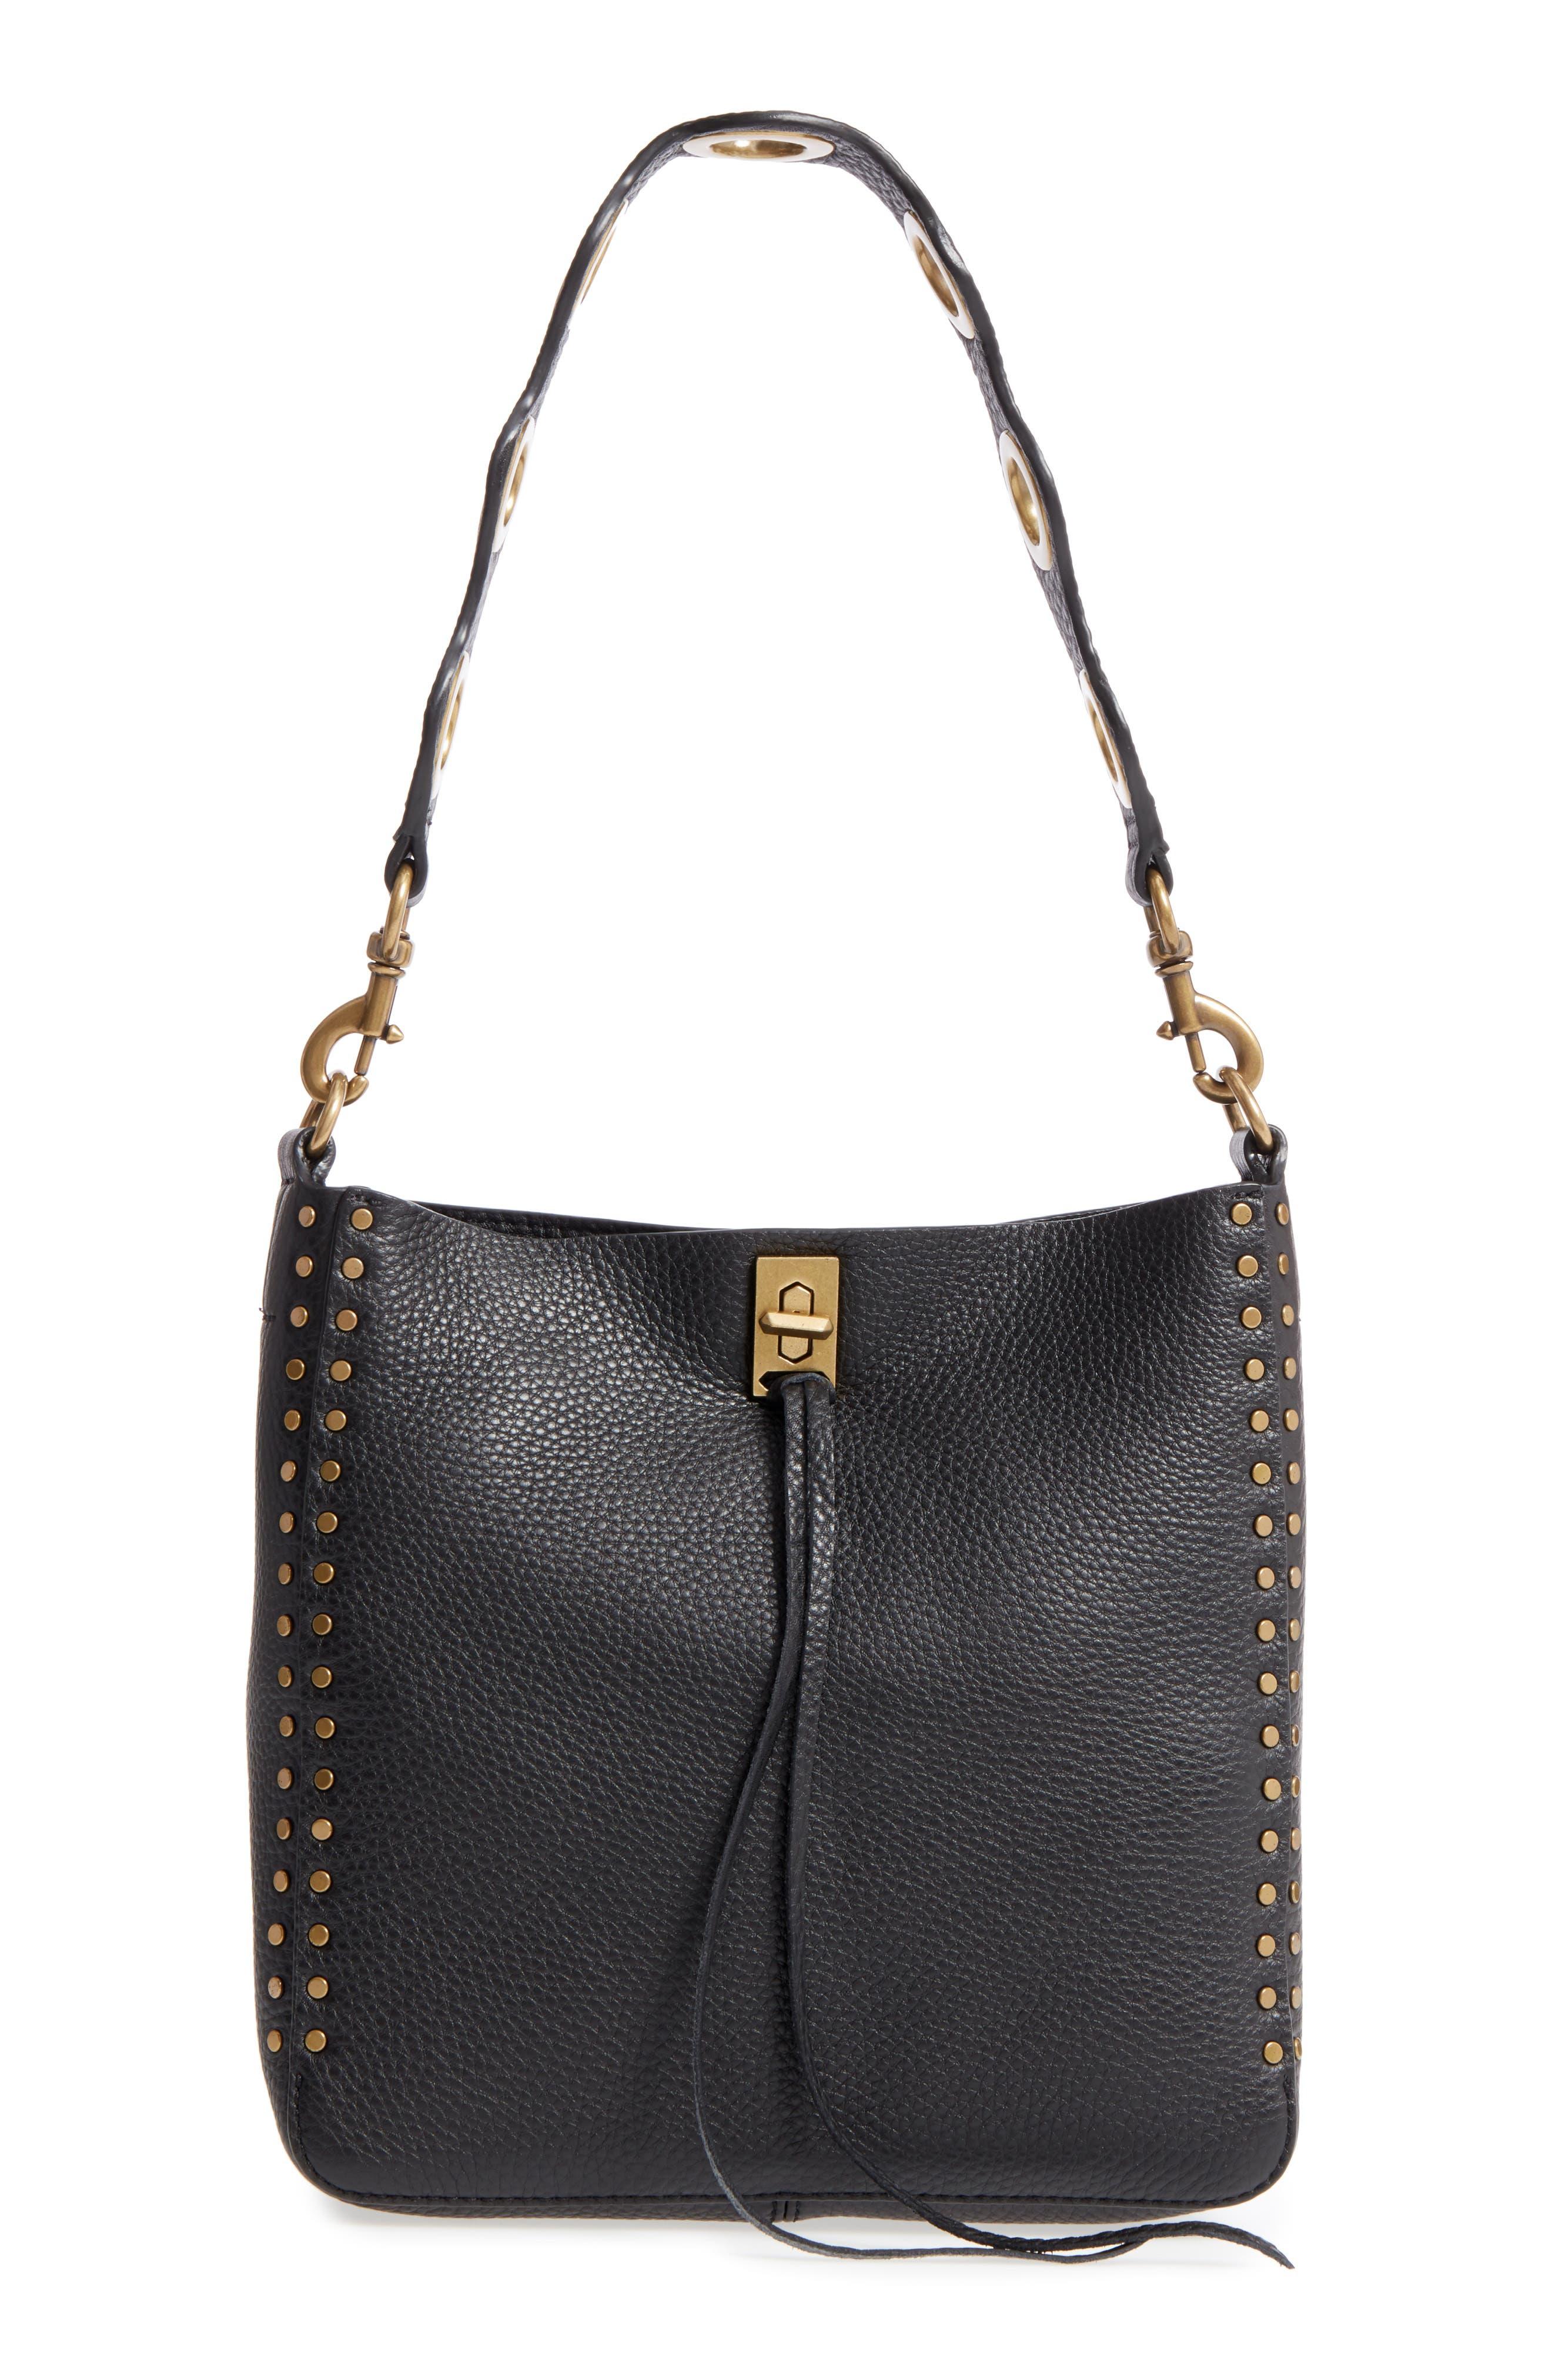 REBECCA MINKOFF, Small Darren Deerskin Leather Feed Bag, Main thumbnail 1, color, BLACK